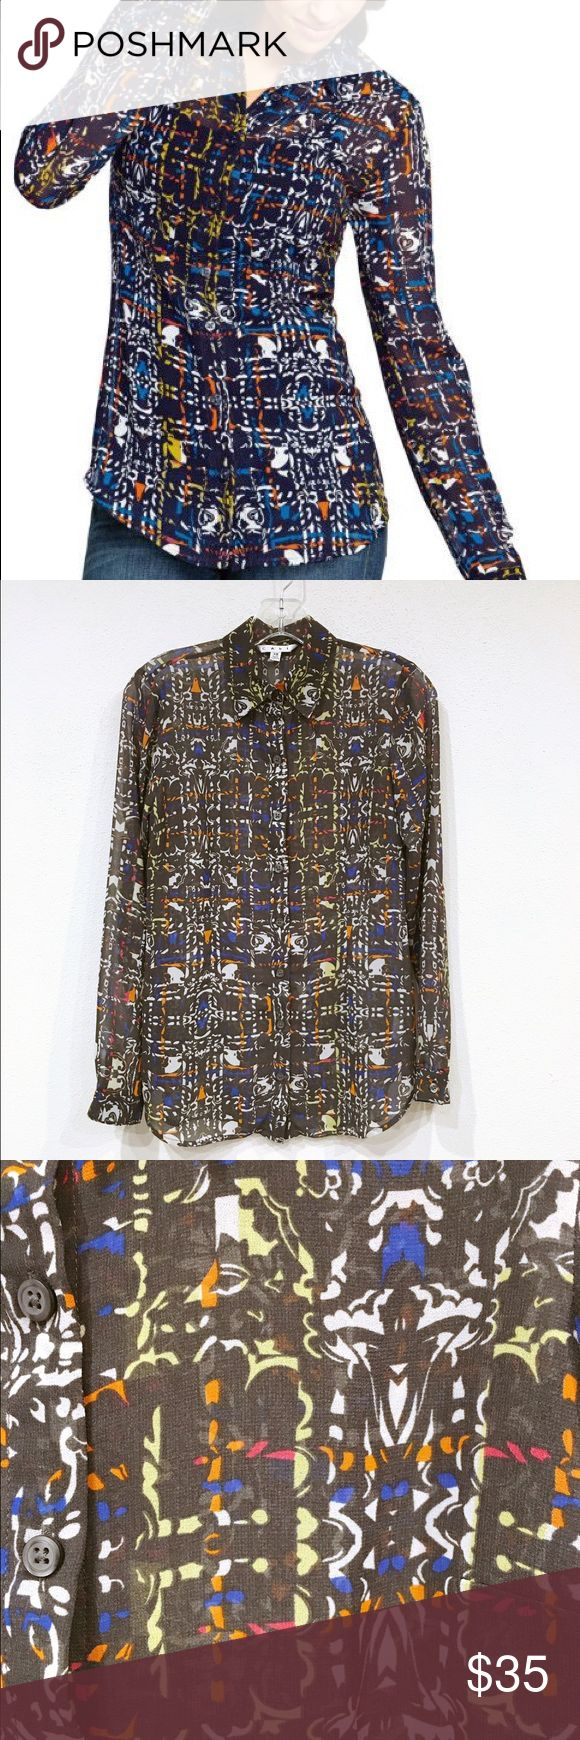 ‼️On Sale‼️ Cabi Festival blouse Excellent condition. No trades. 0905 CAbi Tops Blouses